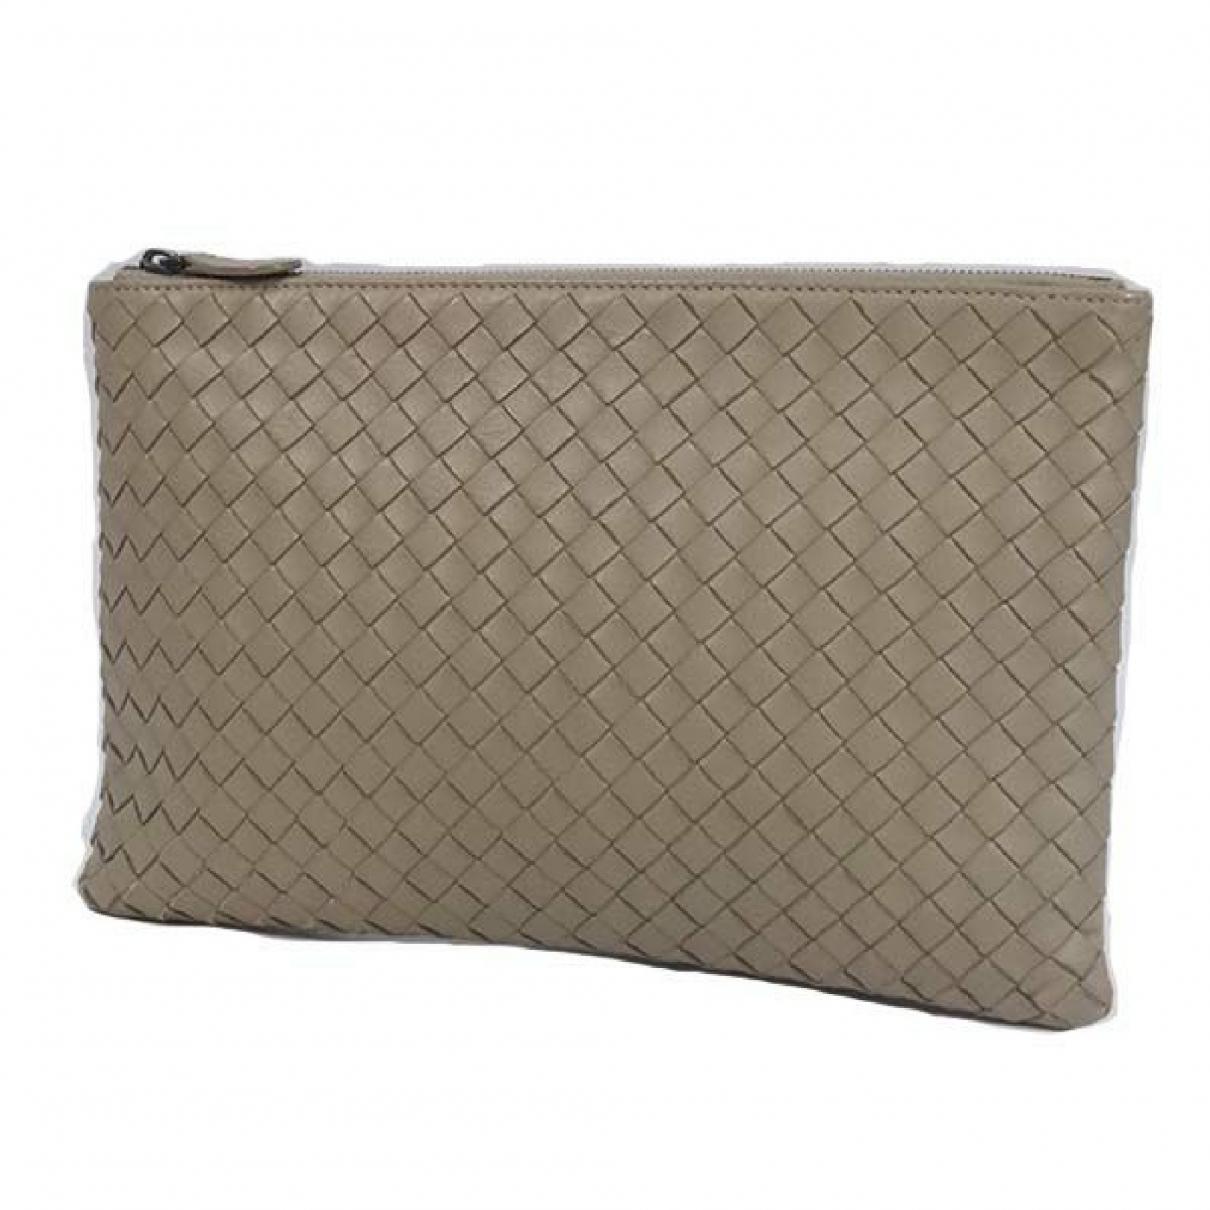 Bottega Veneta \N Grey Leather Purses, wallet & cases for Women \N